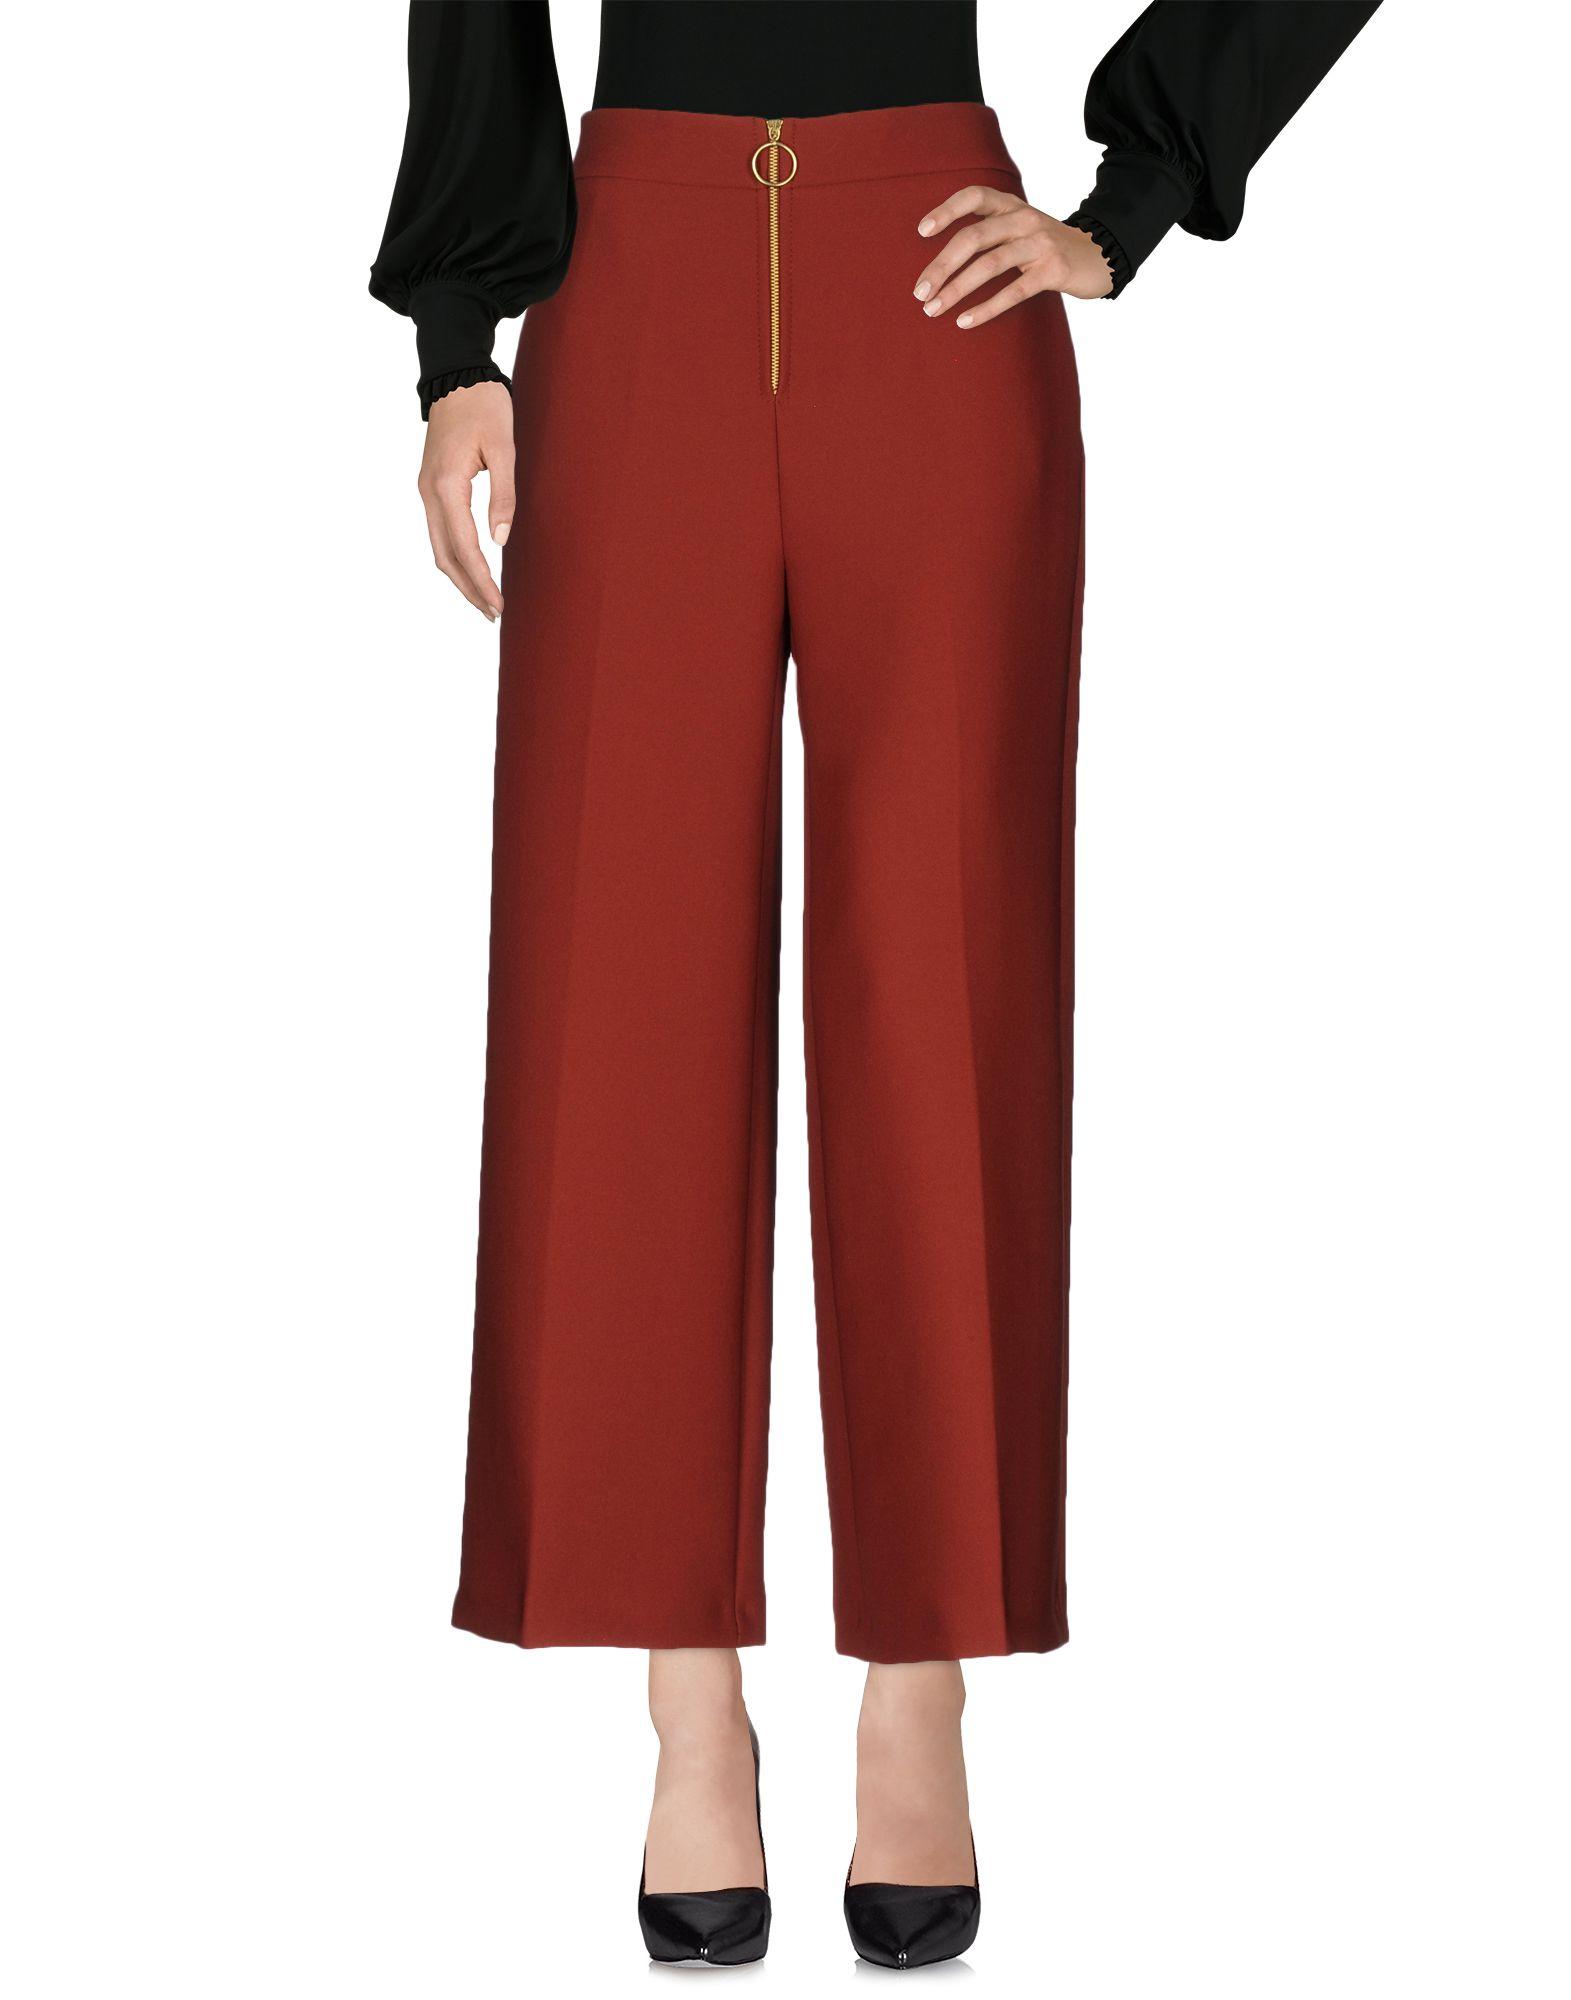 Pantalone Jucca donna - 36997420EM 36997420EM